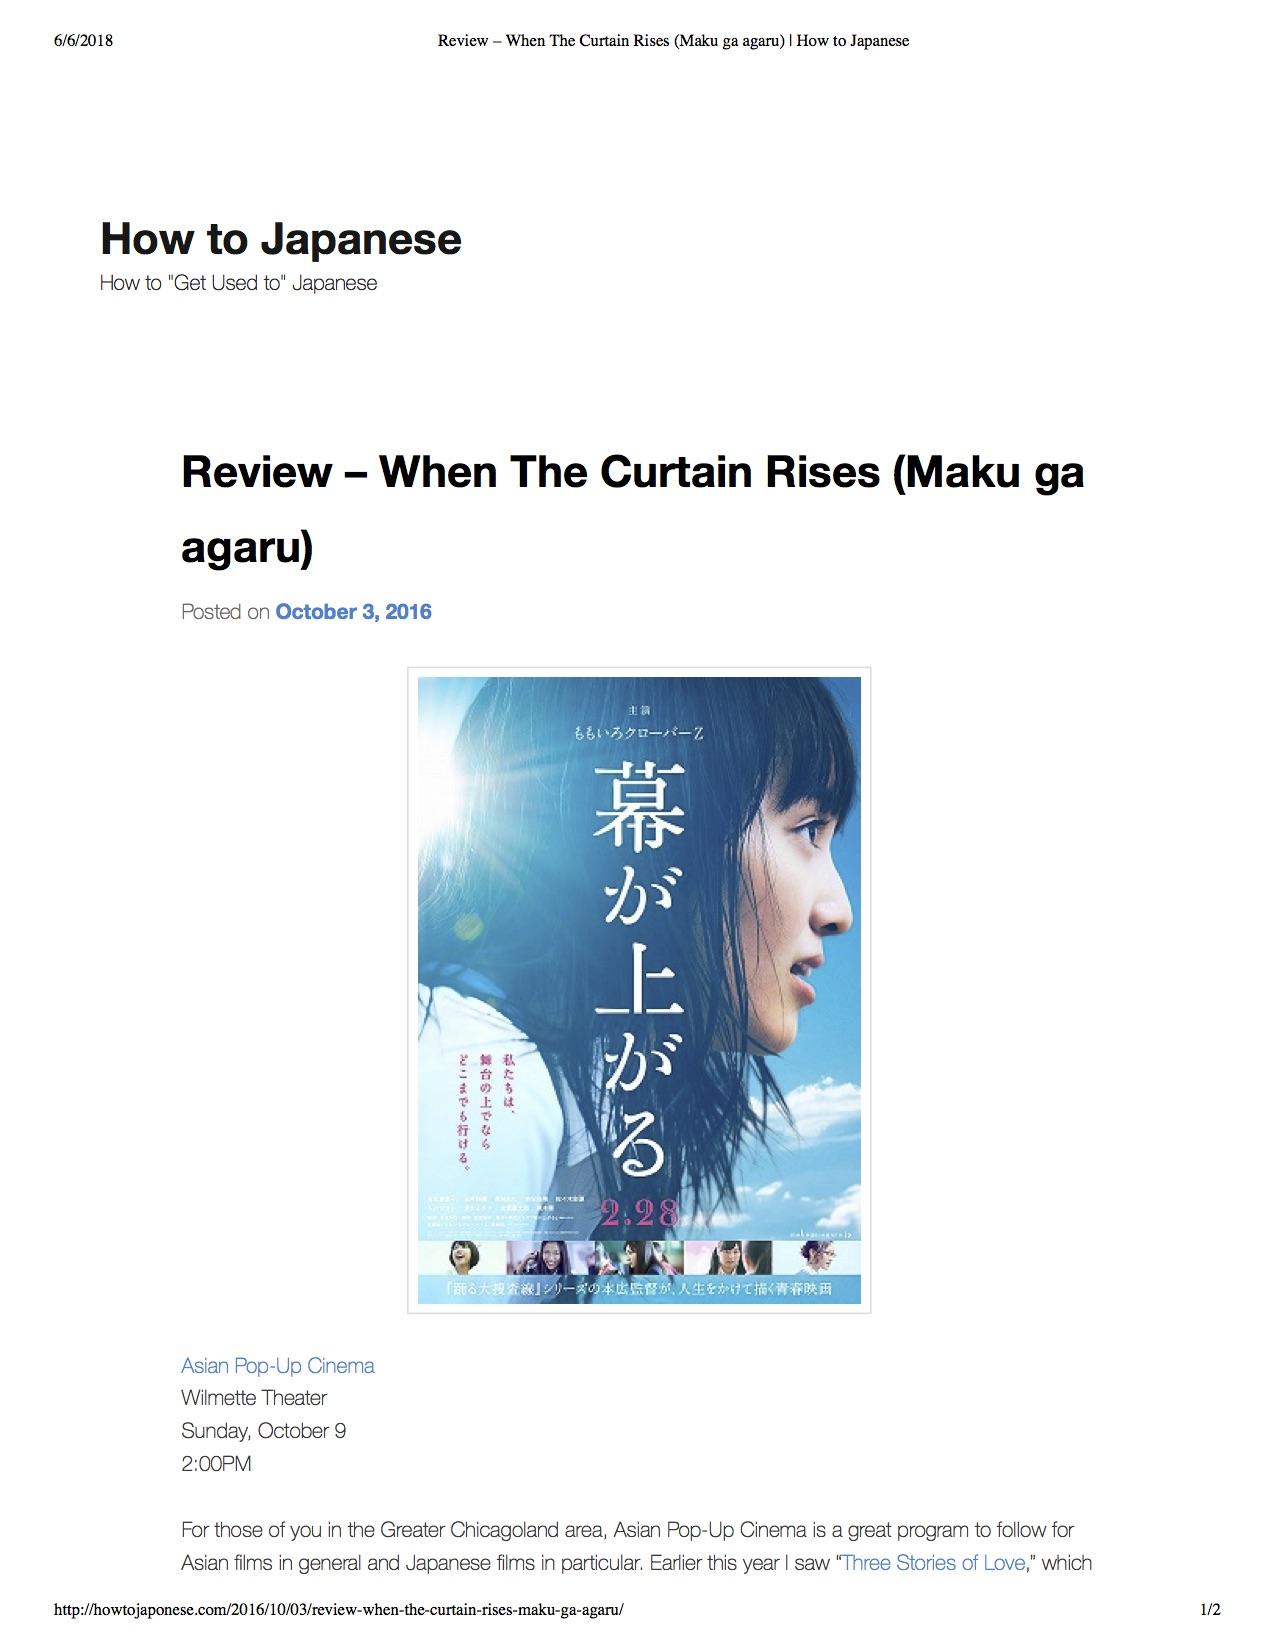 1Review – When The Curtain Rises (Maku ga agaru) _ How to Japanese.jpg